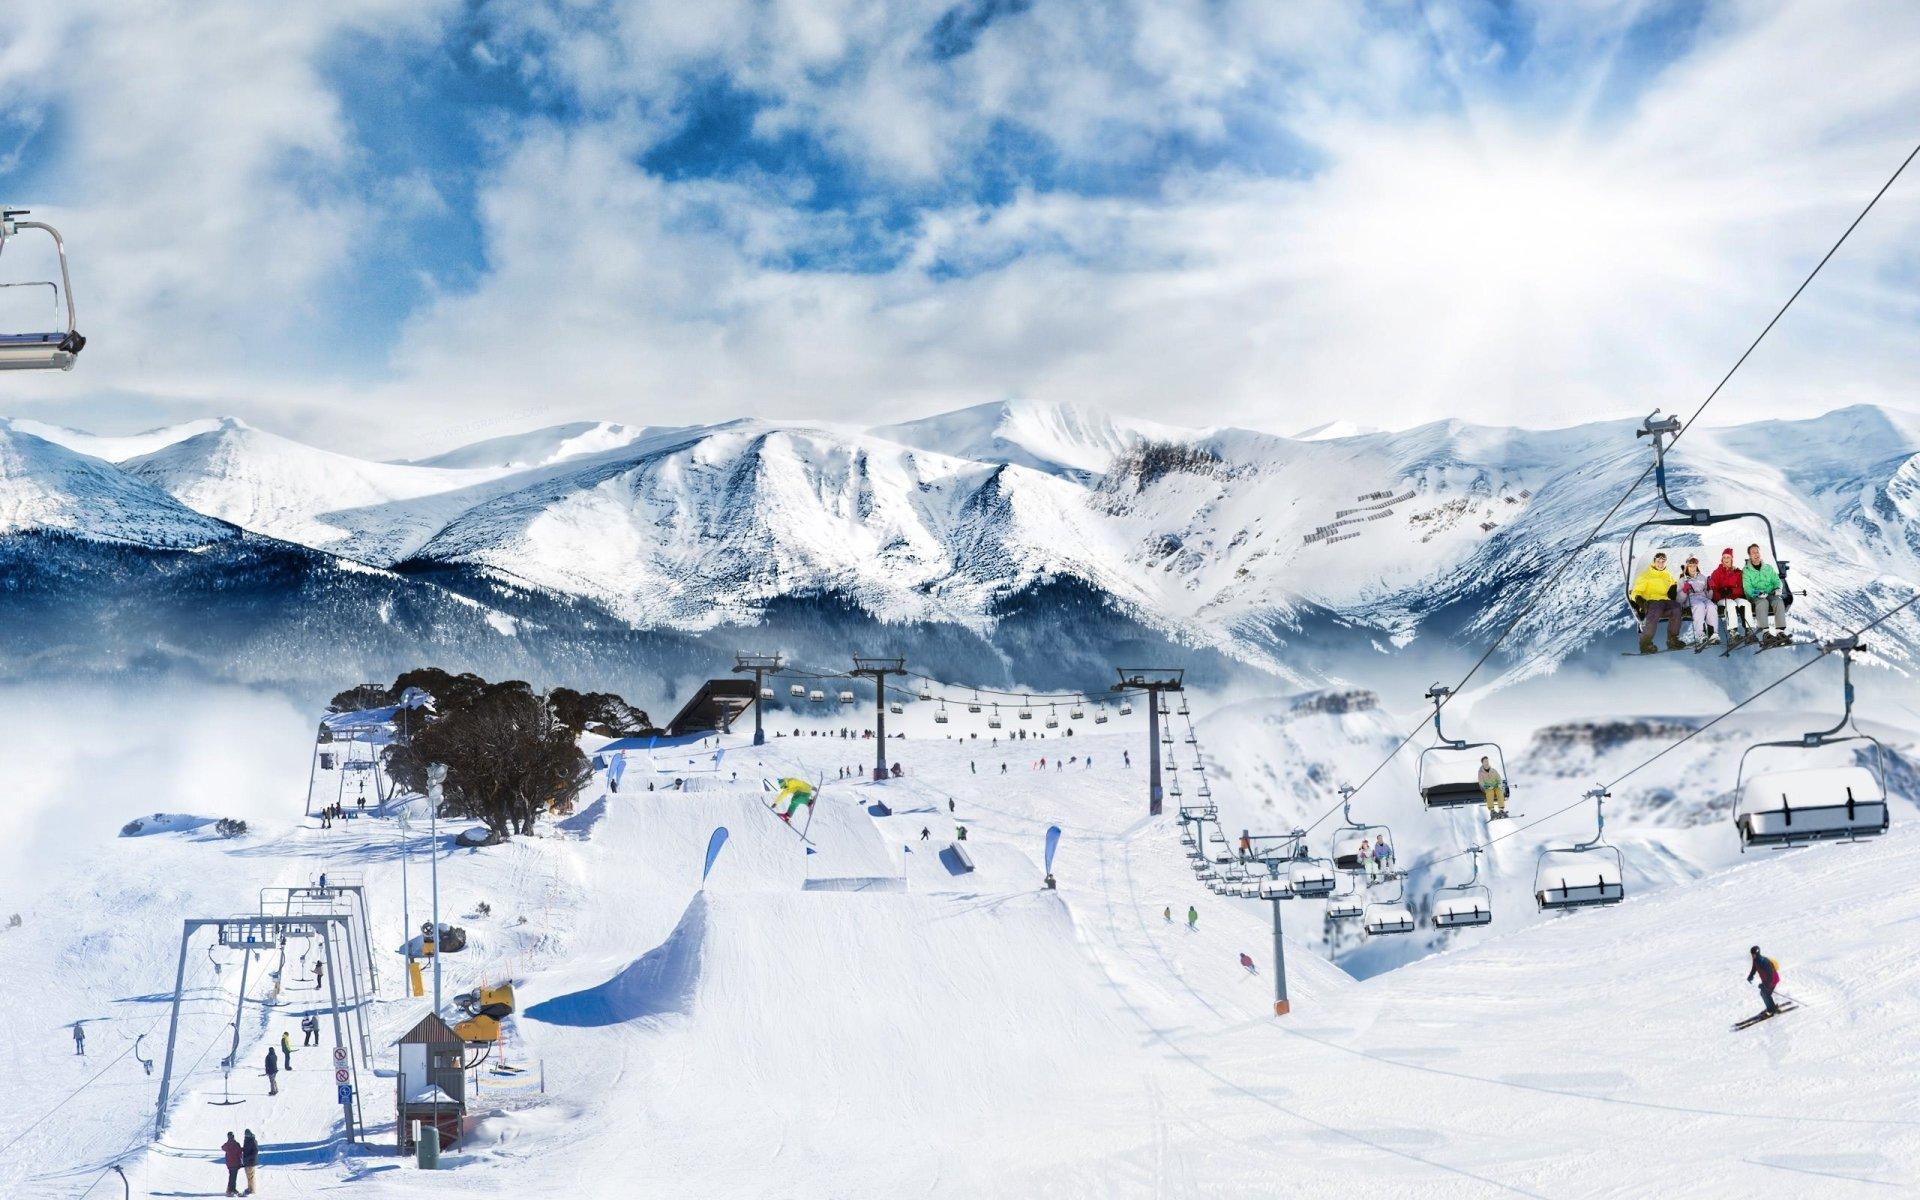 Skiing Sport Wallpaper Iphone: Skiing HD Wallpaper